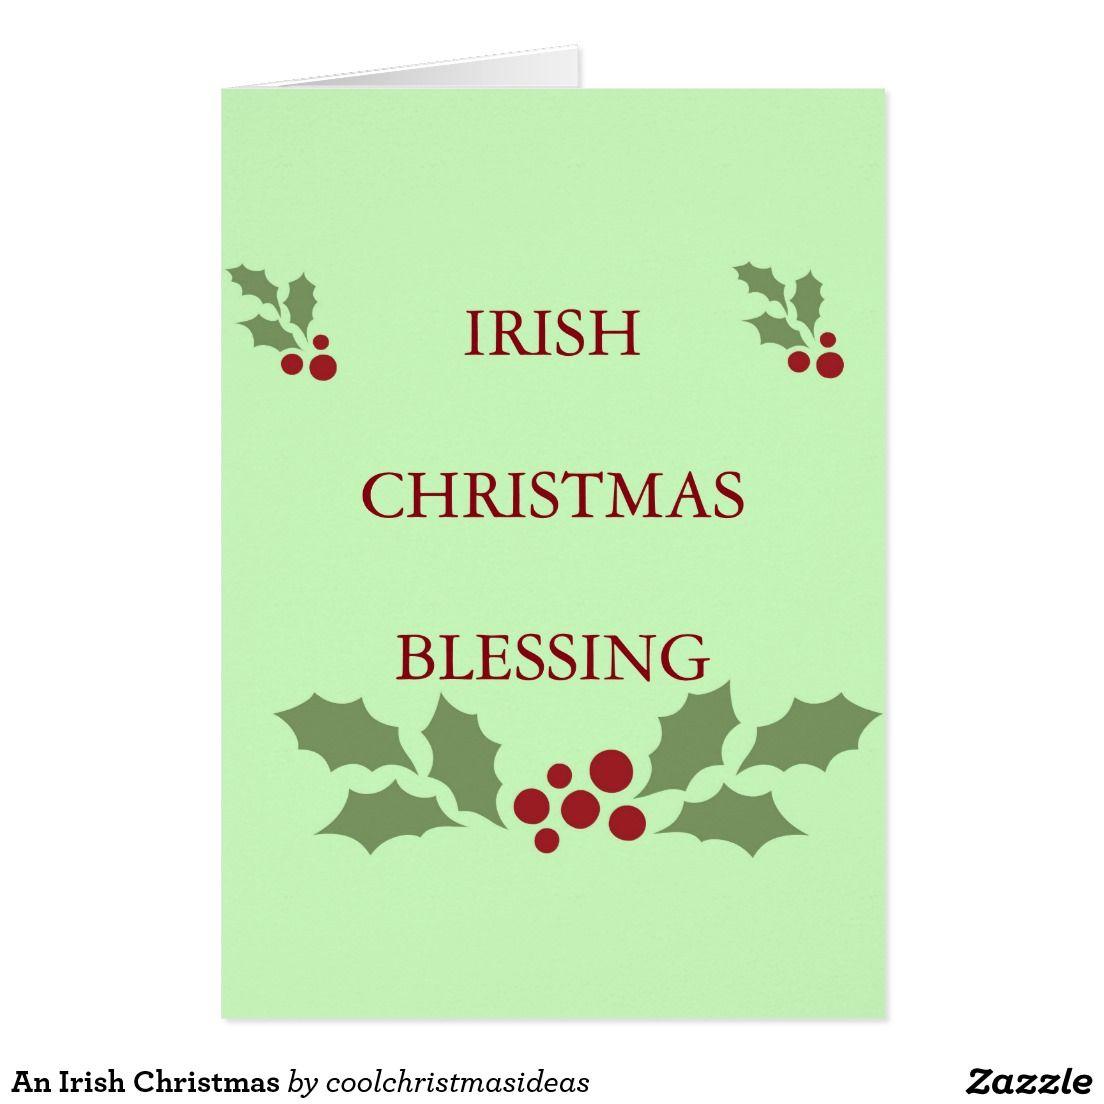 An Irish Christmas Card | Christmas greeting cards